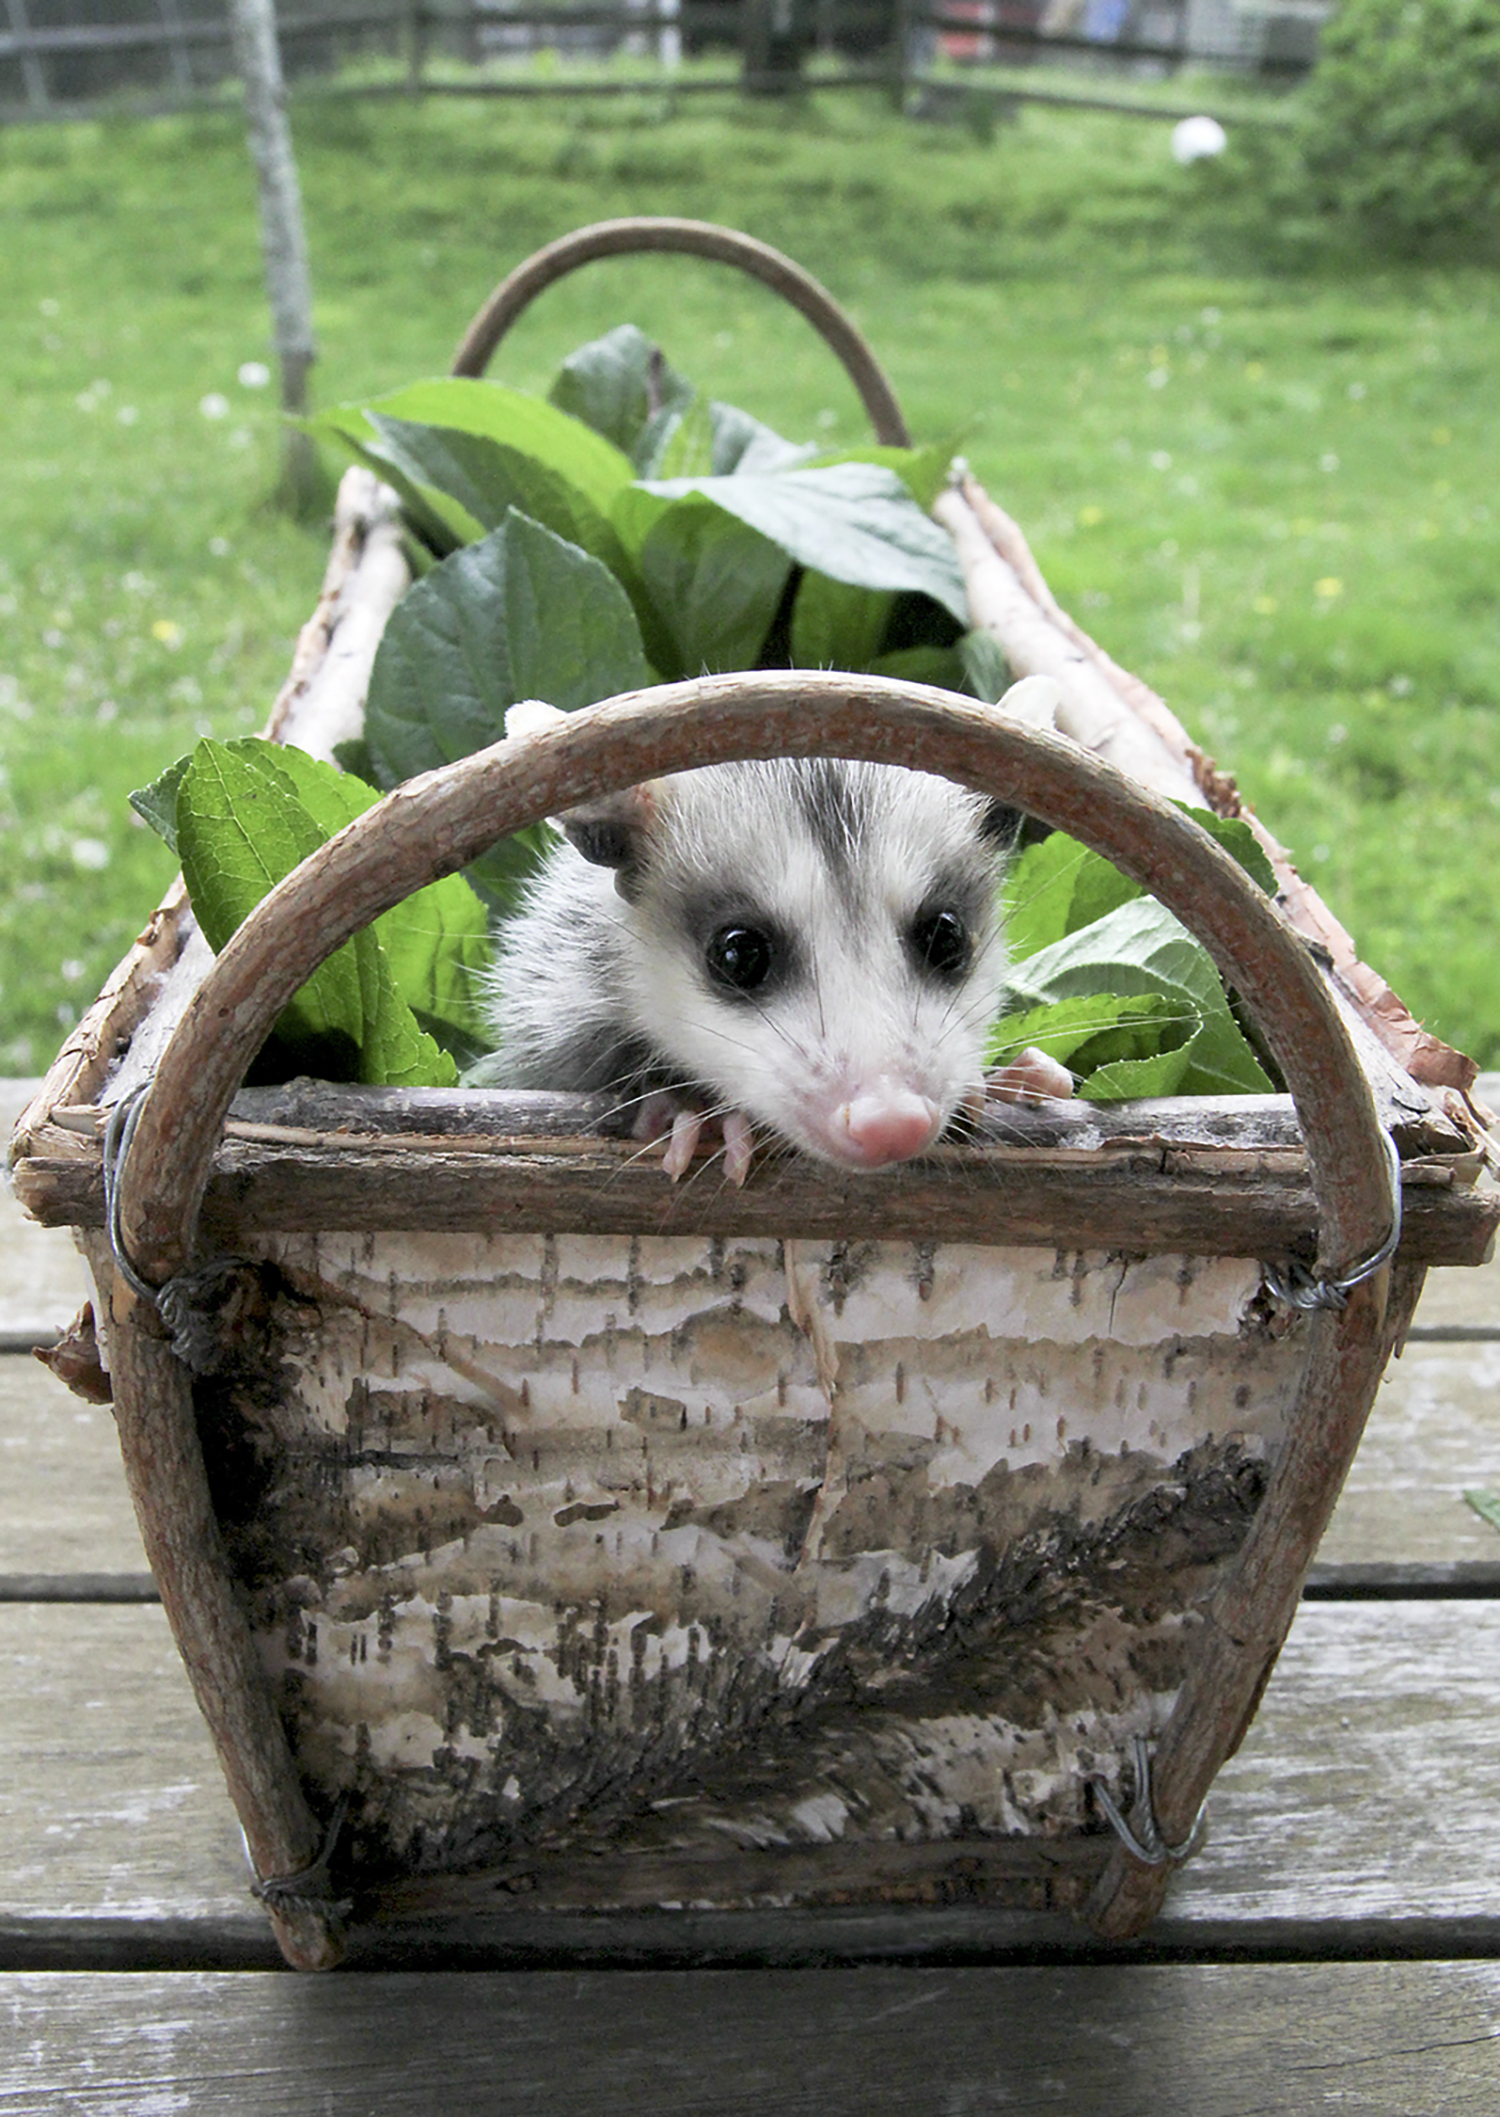 Opossum-Possum-Baby-Wildlife-Sanctuary.jpg